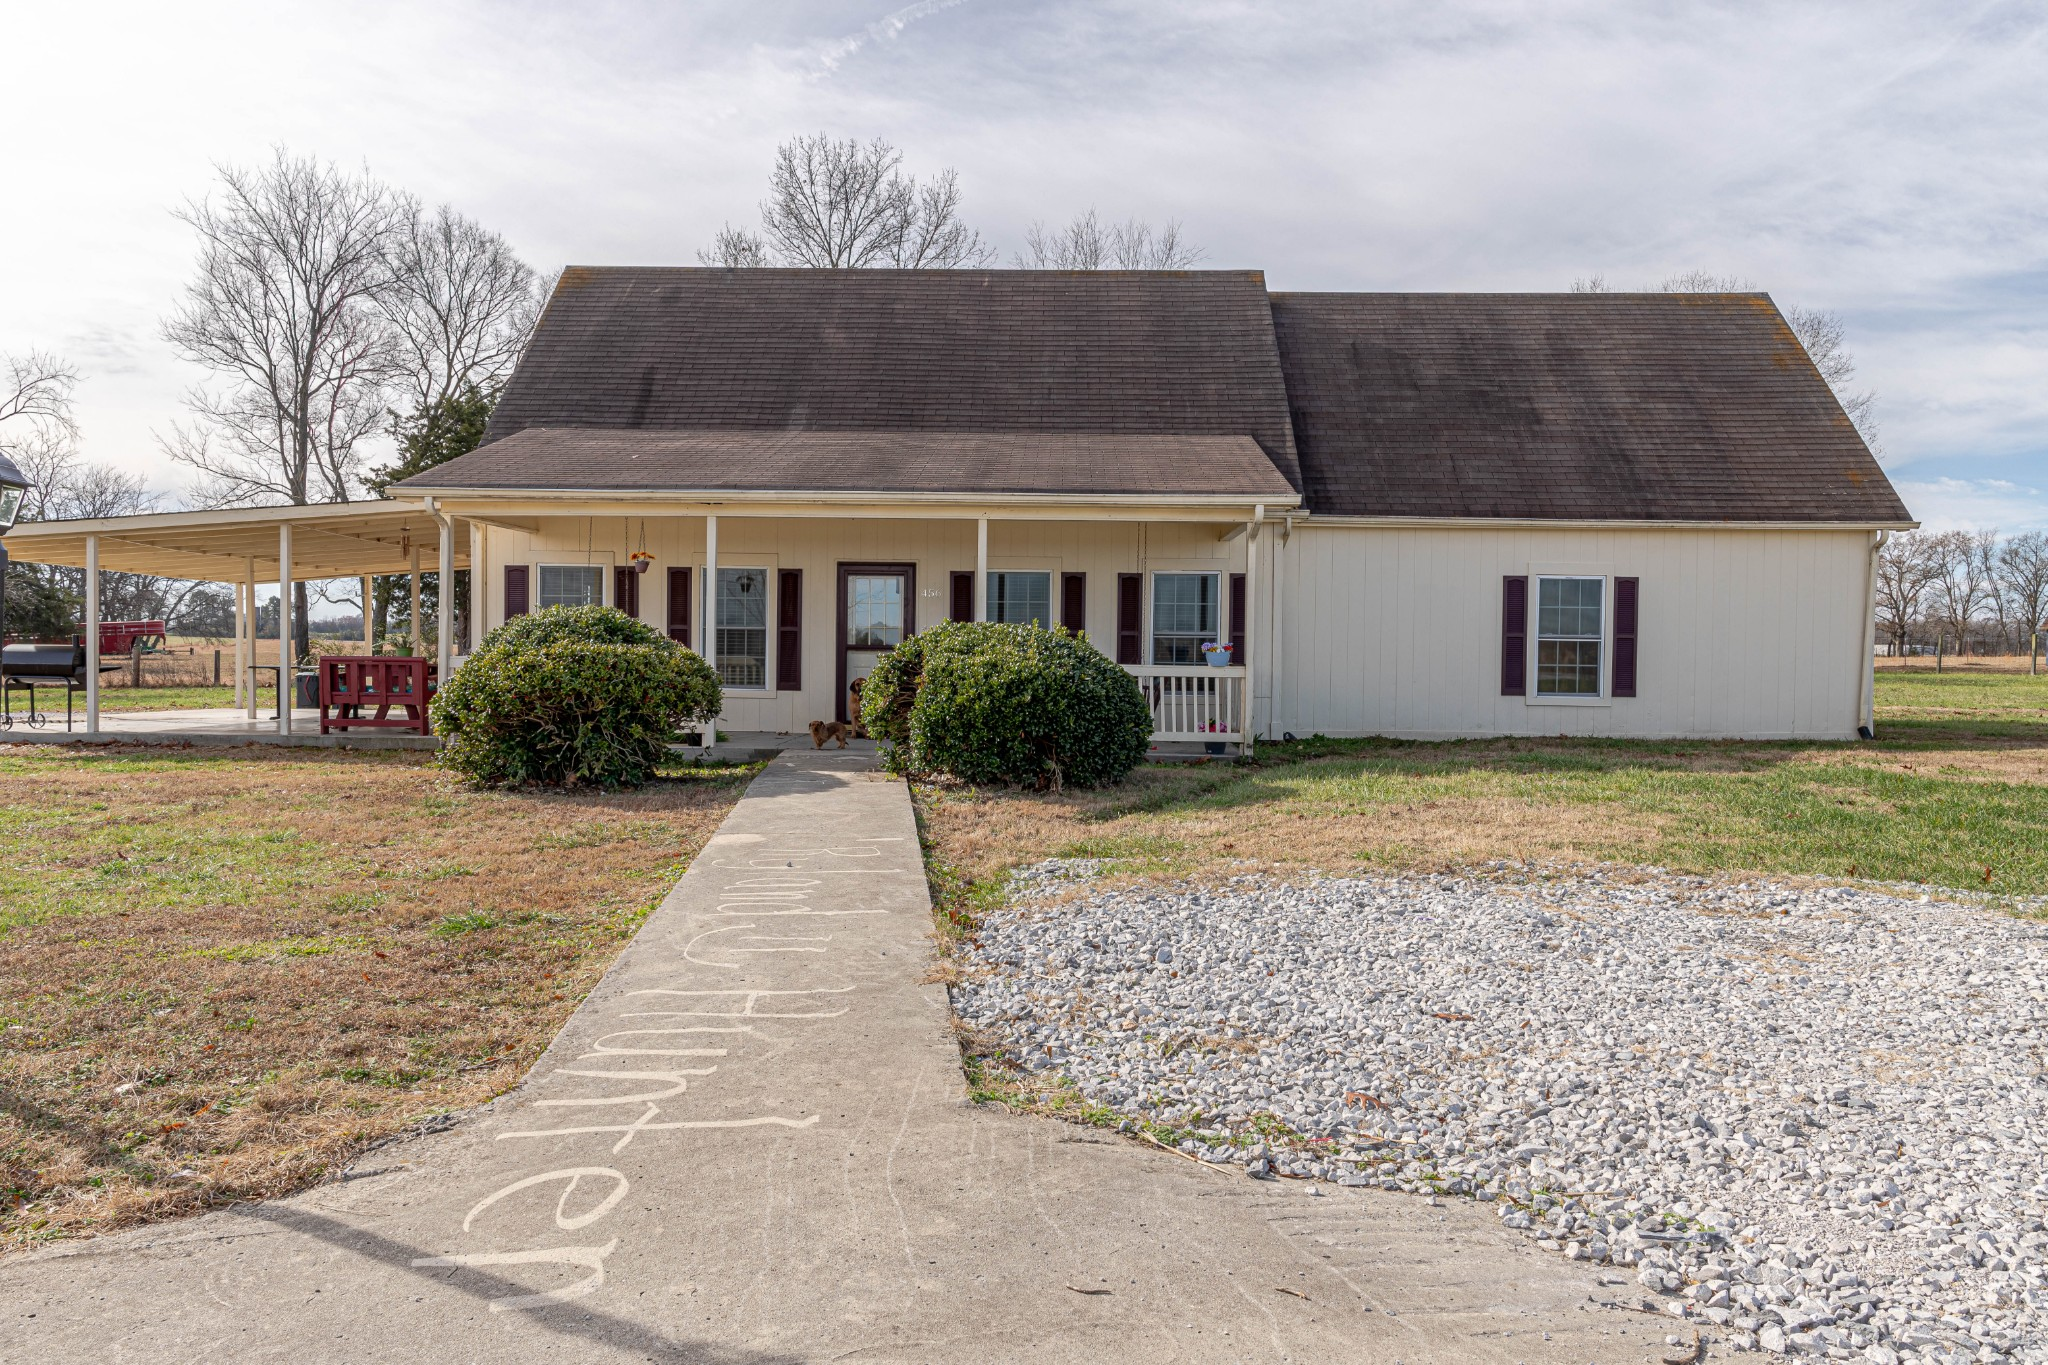 456 Ben Lasater Rd, Hillsboro, TN 37342 - Hillsboro, TN real estate listing